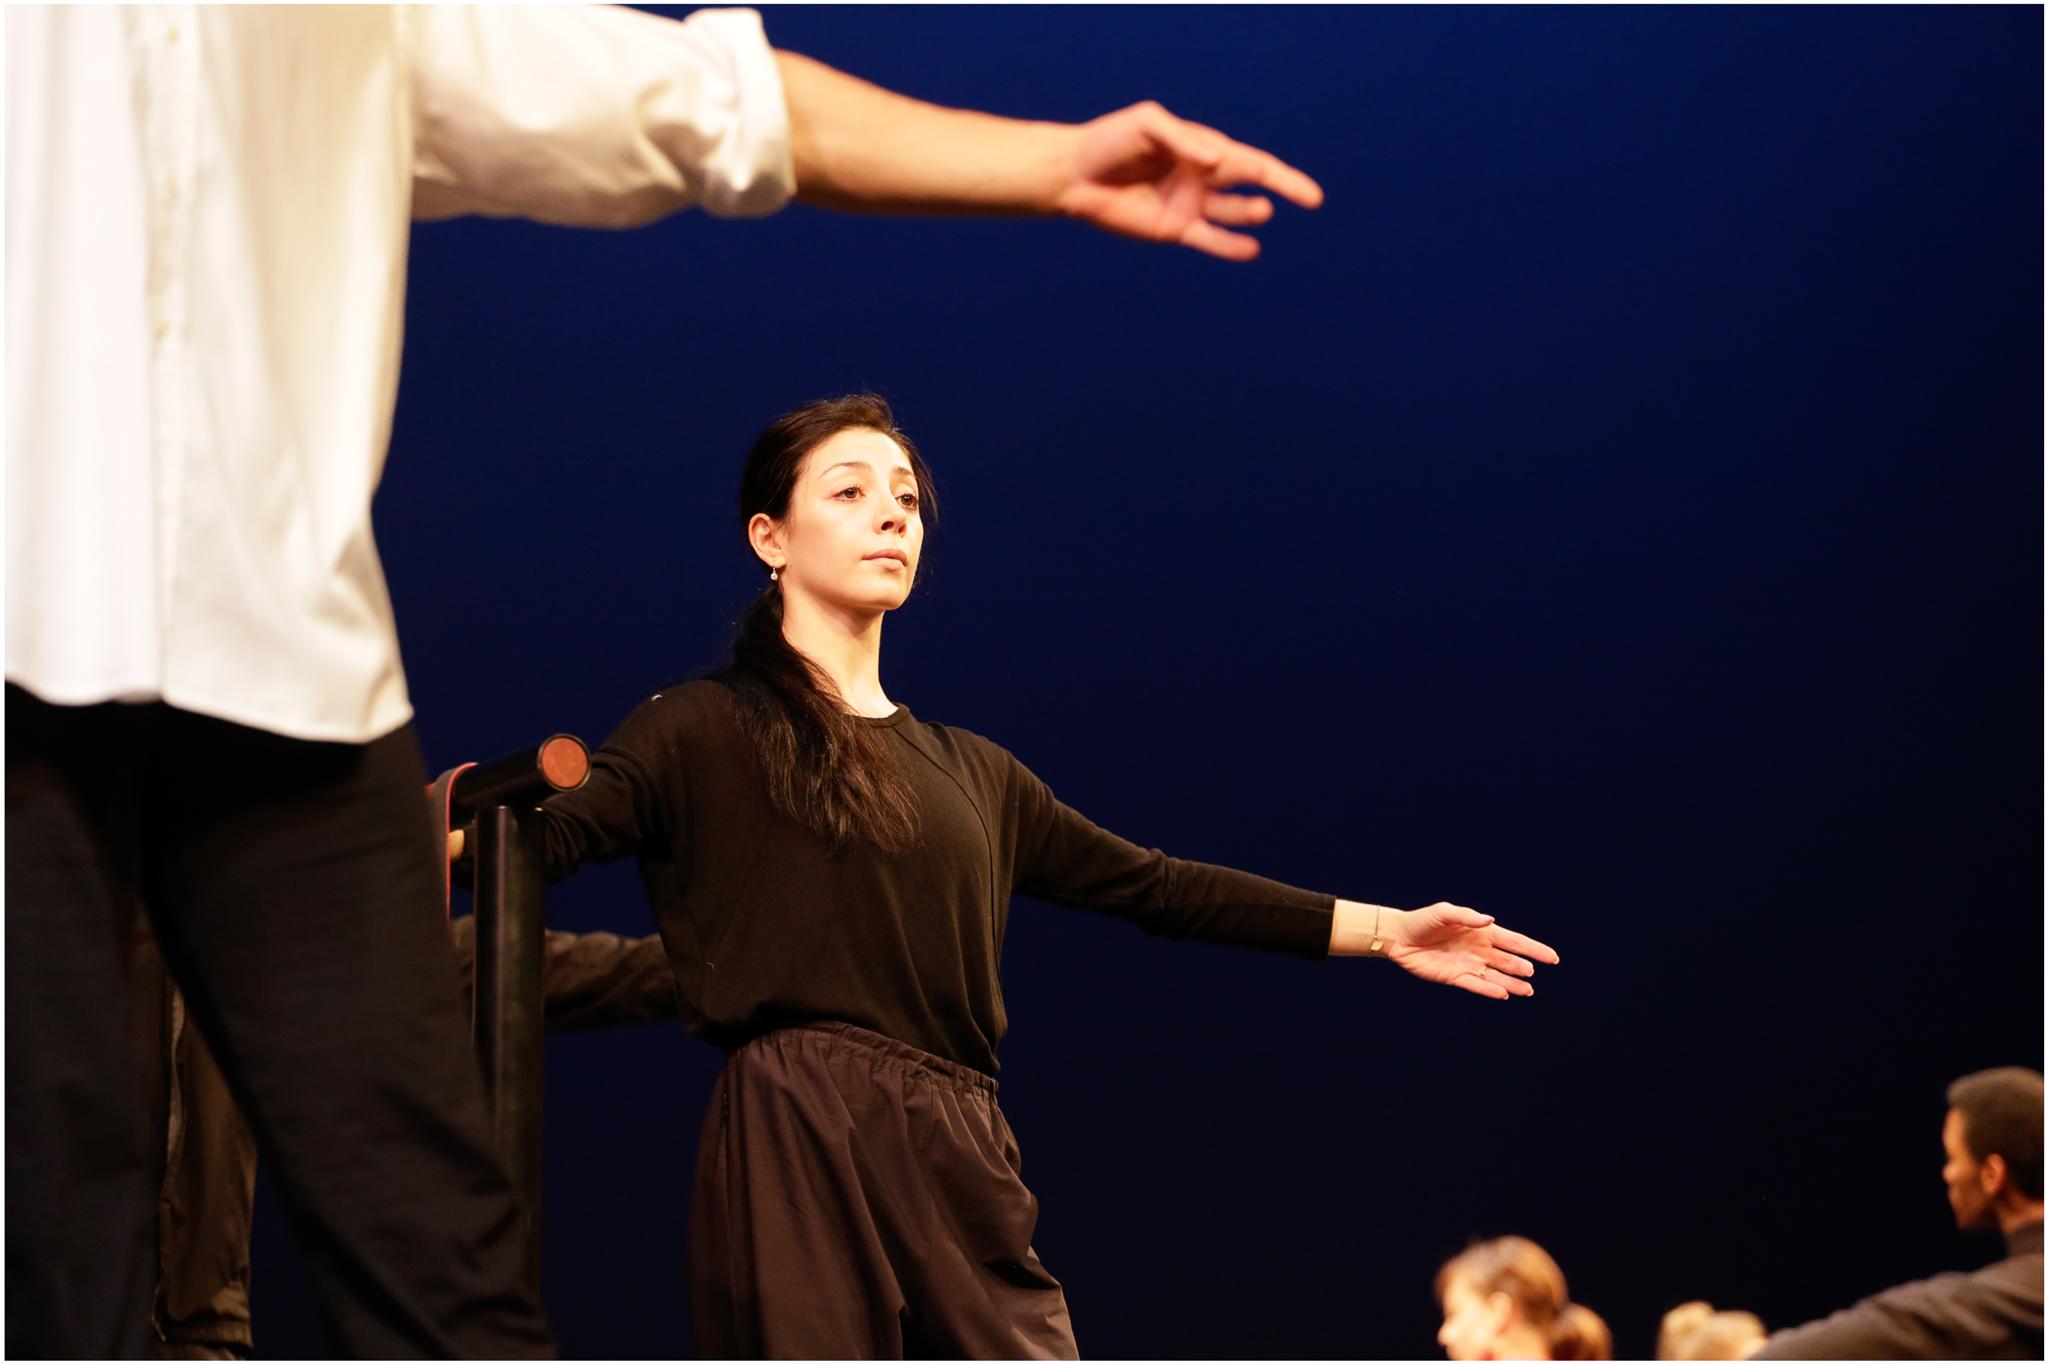 011_Fotografie Nationale Opera Ballet.jpg